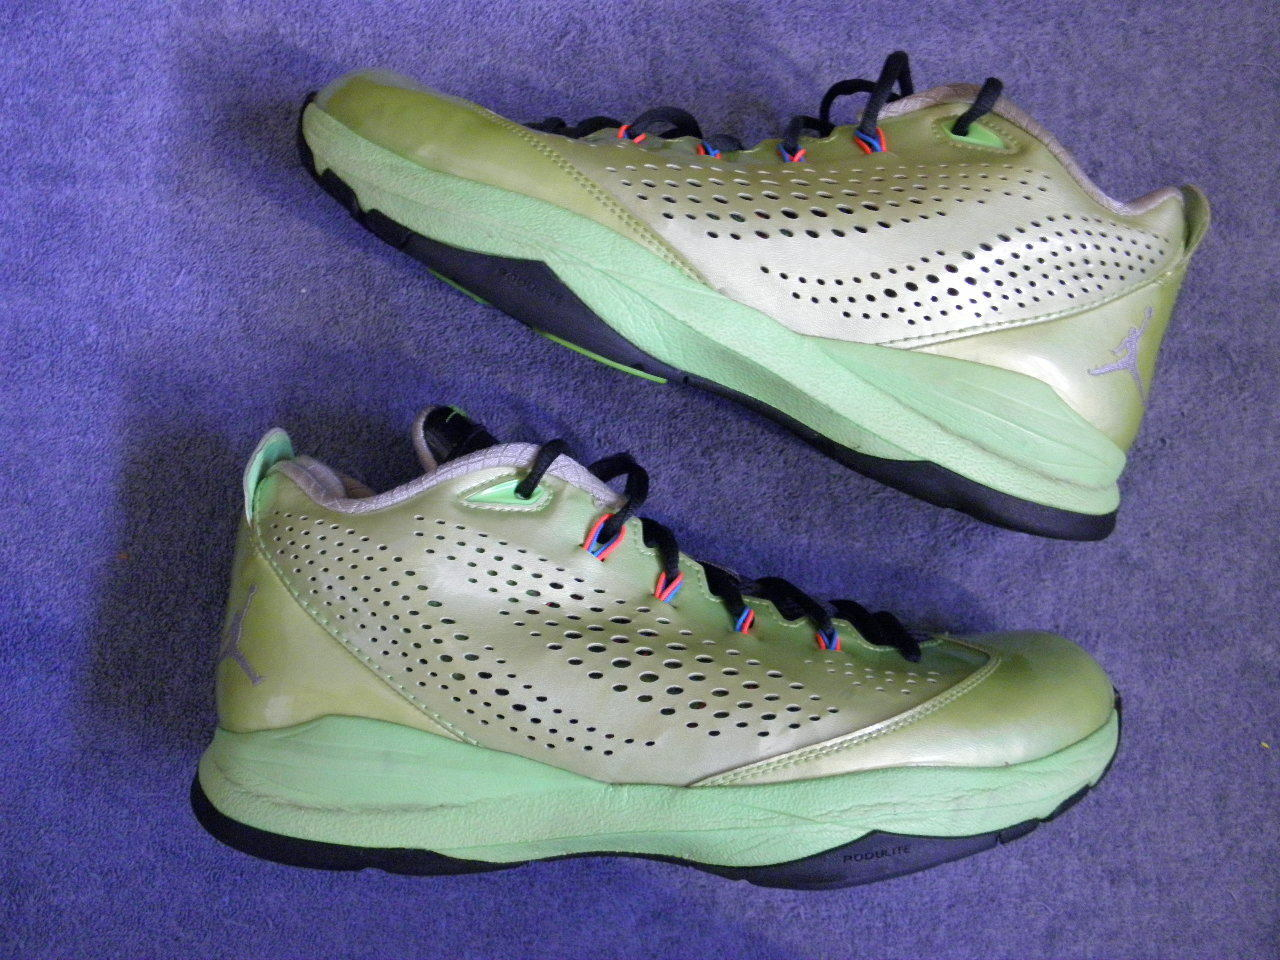 Nike Air Jordan CP3 VII Chris Paul 7 Electric Green size 11 EUC VI 6 Six Retro